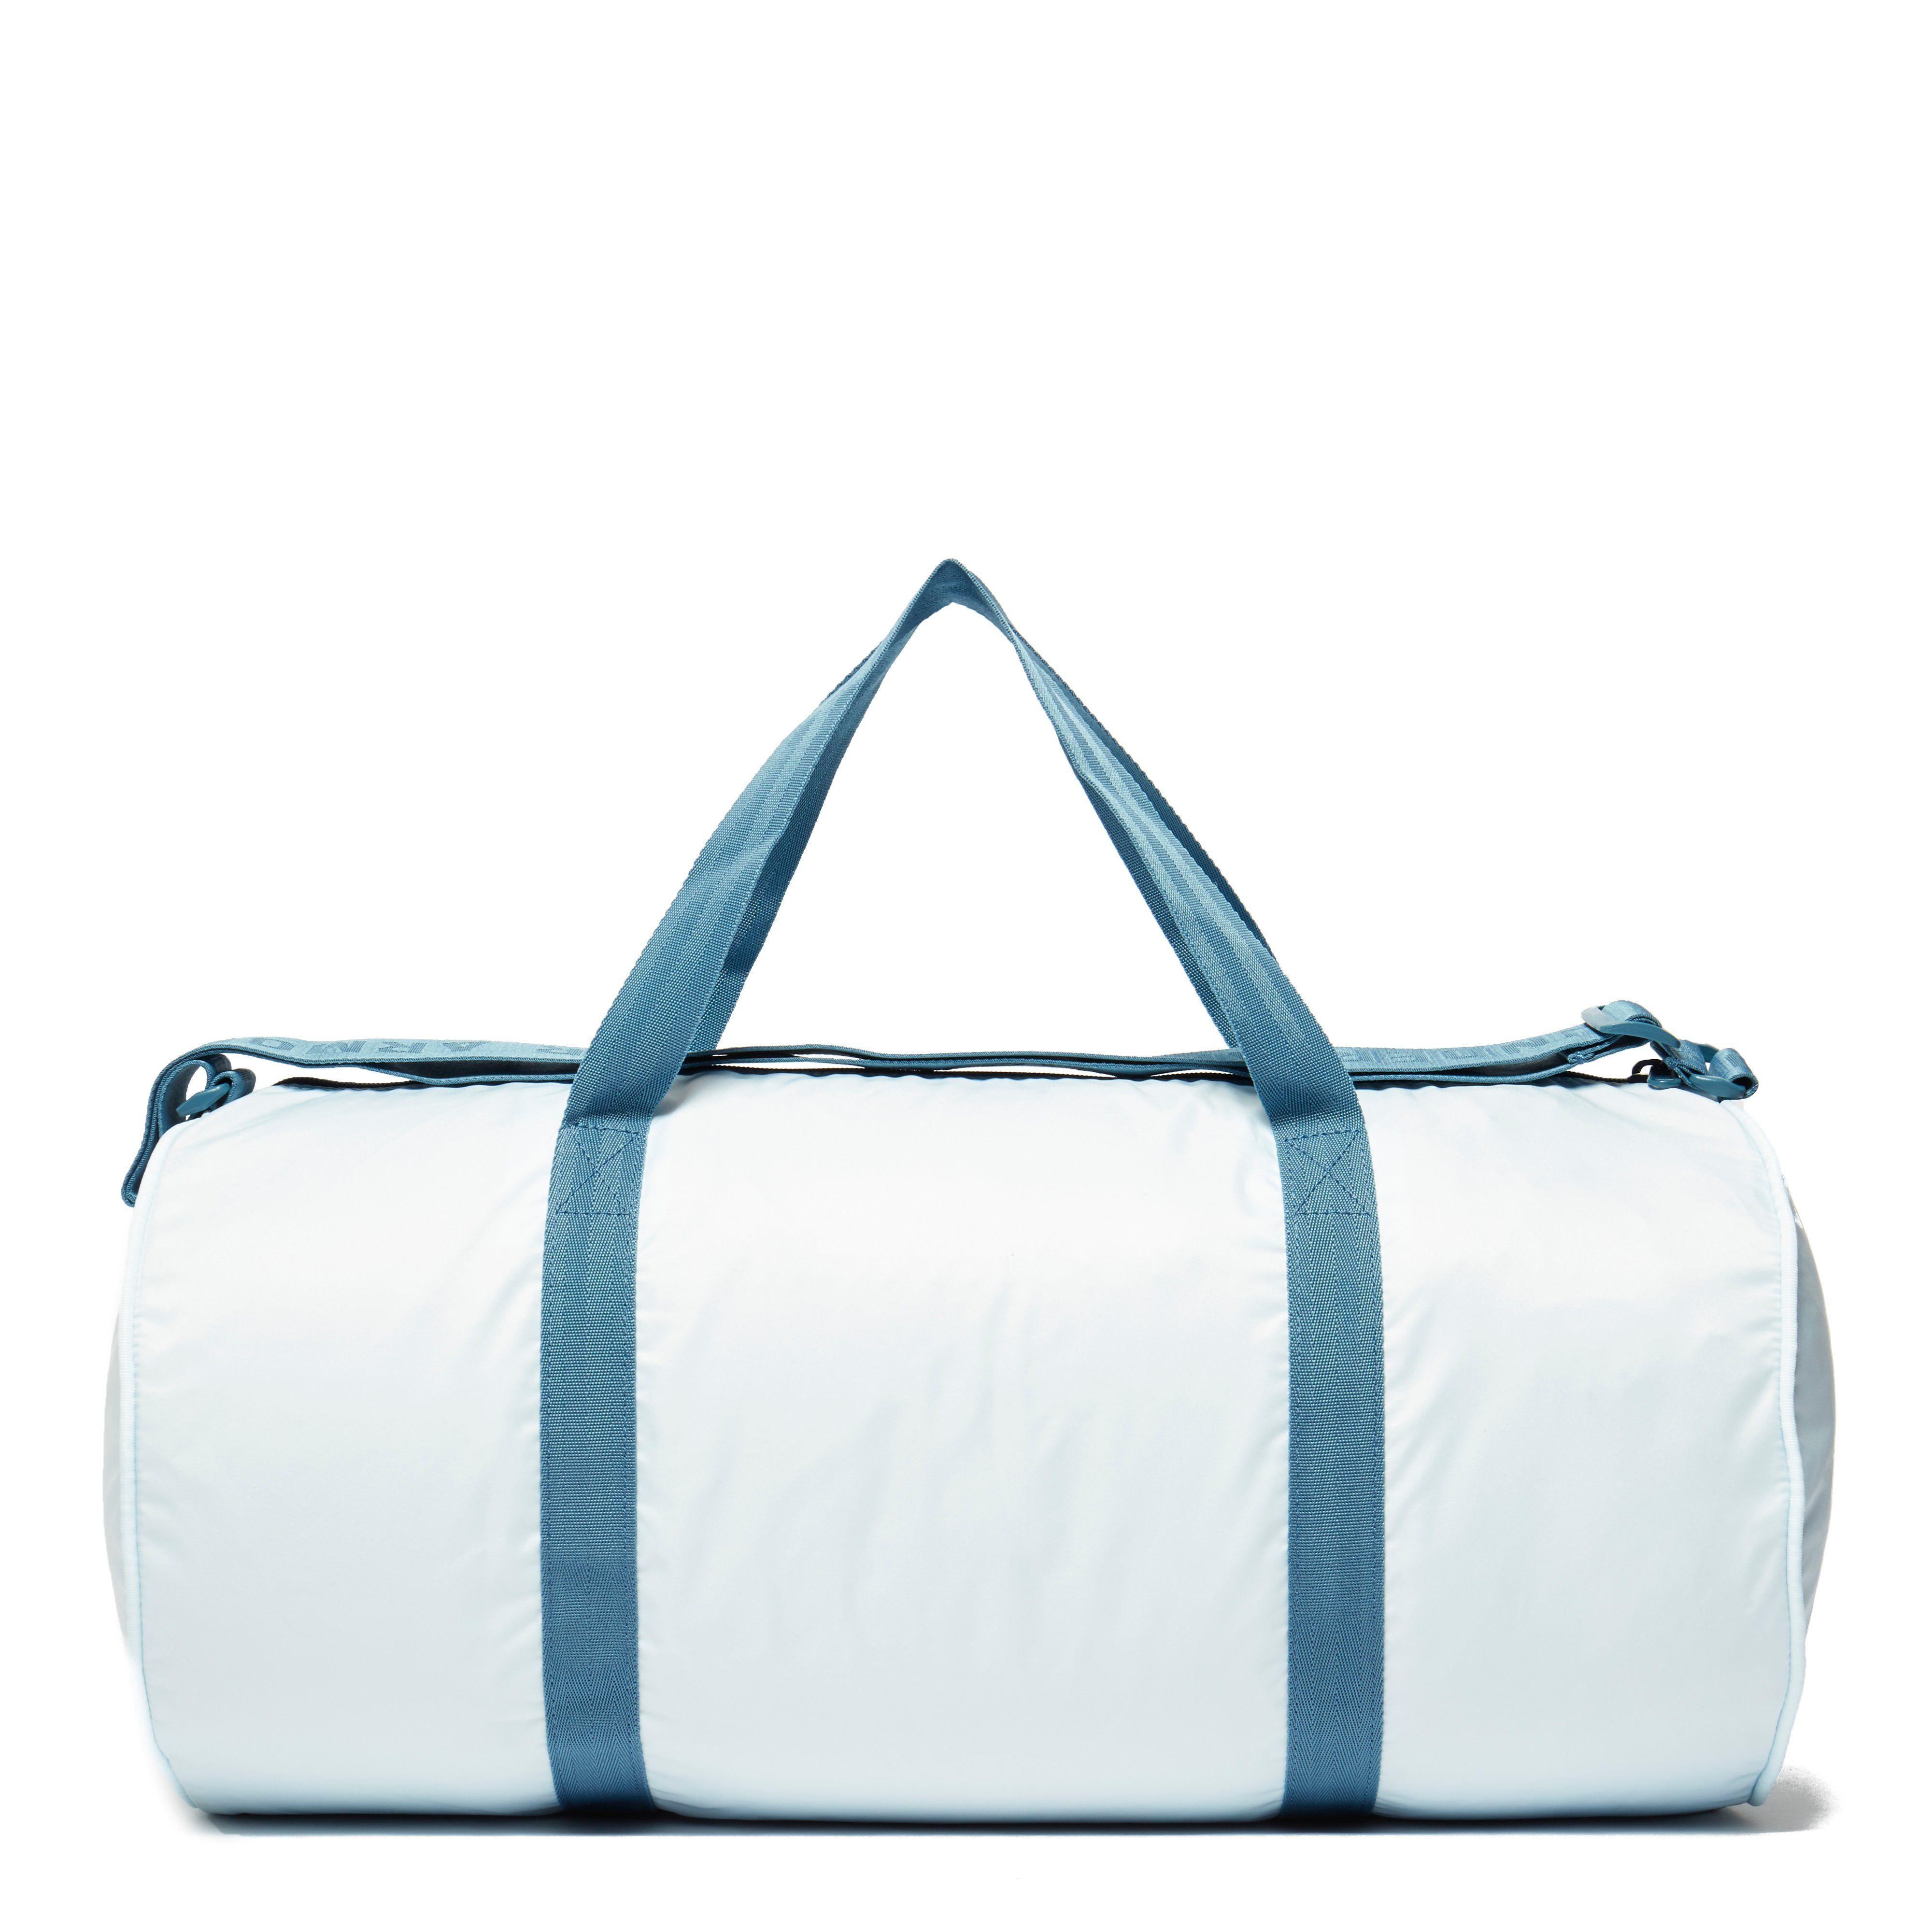 Under Armour Favourite 2.0 Duffel Bag